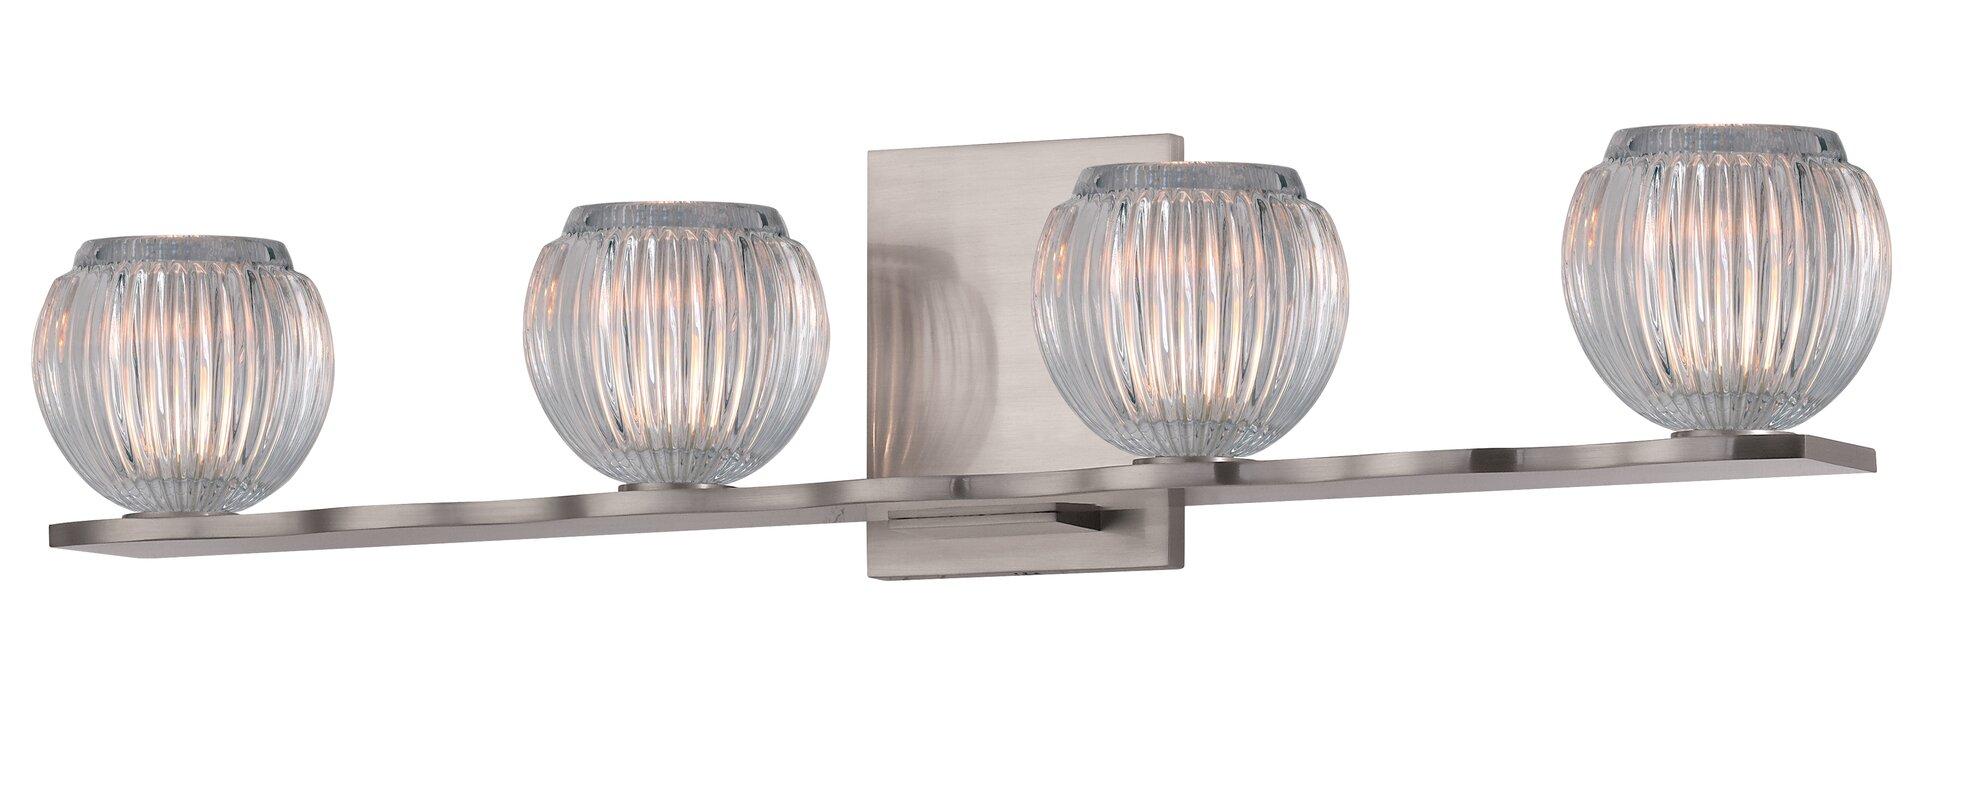 Odem 4-Light Vanity Light